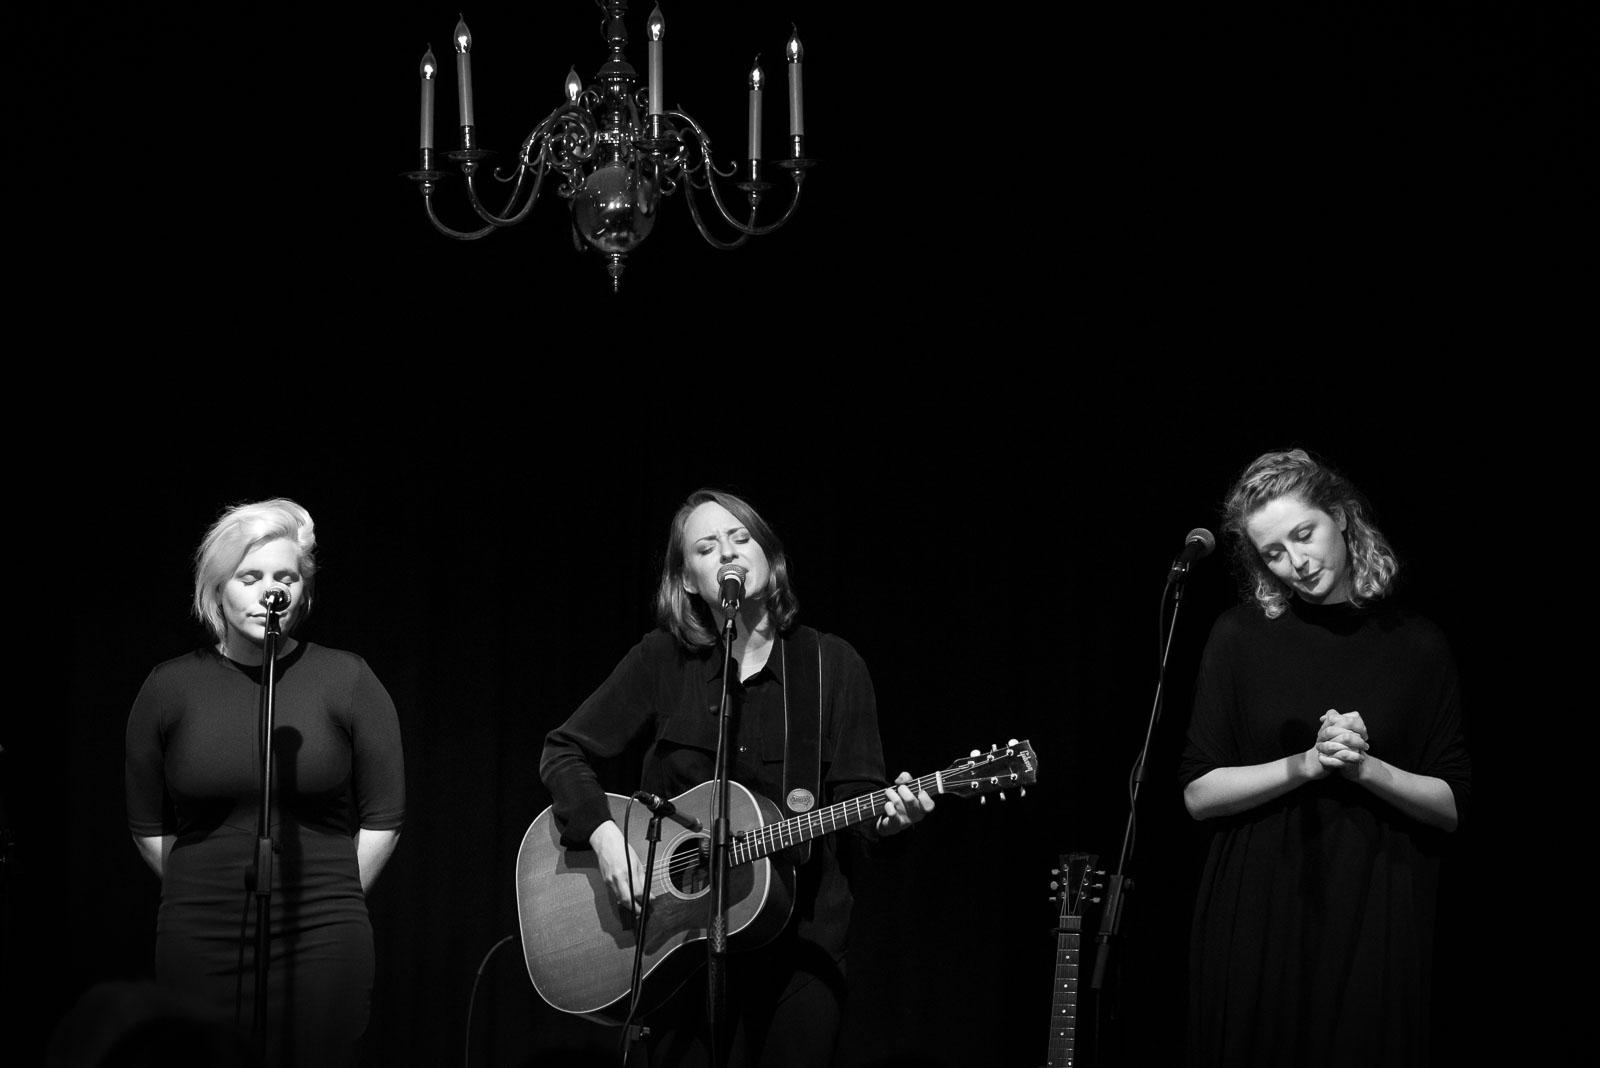 Stephanie Struijk vocals Parelsessies Concertfoto